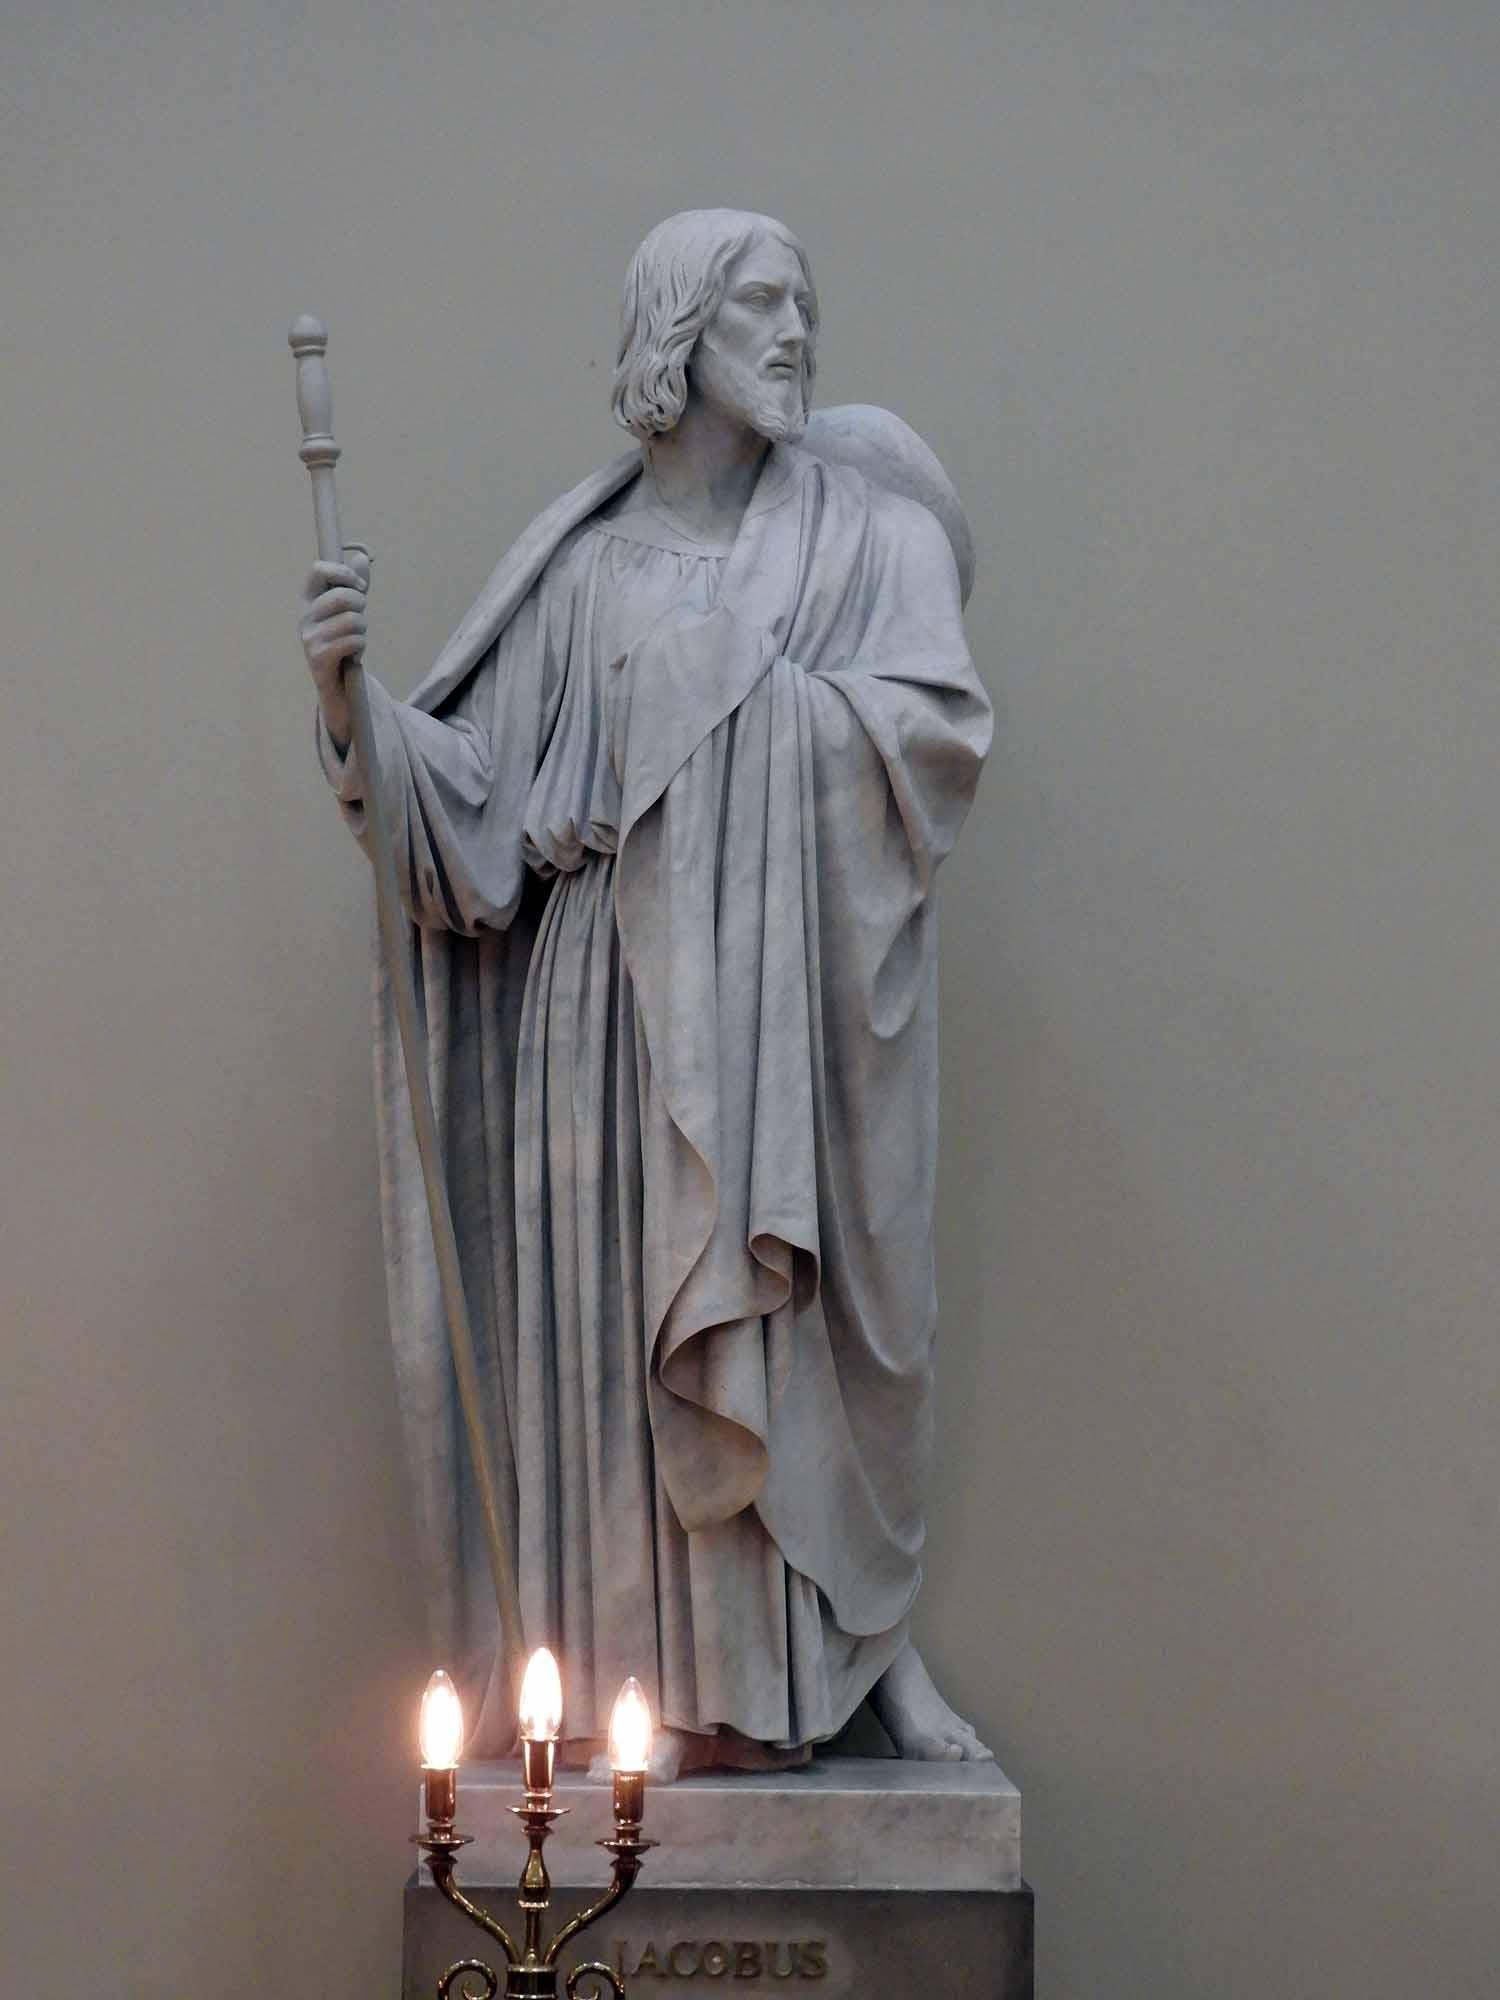 denmark-copenhagen-vor-frue-kirke-cathederal-apostle-iacobus-james-1.JPG